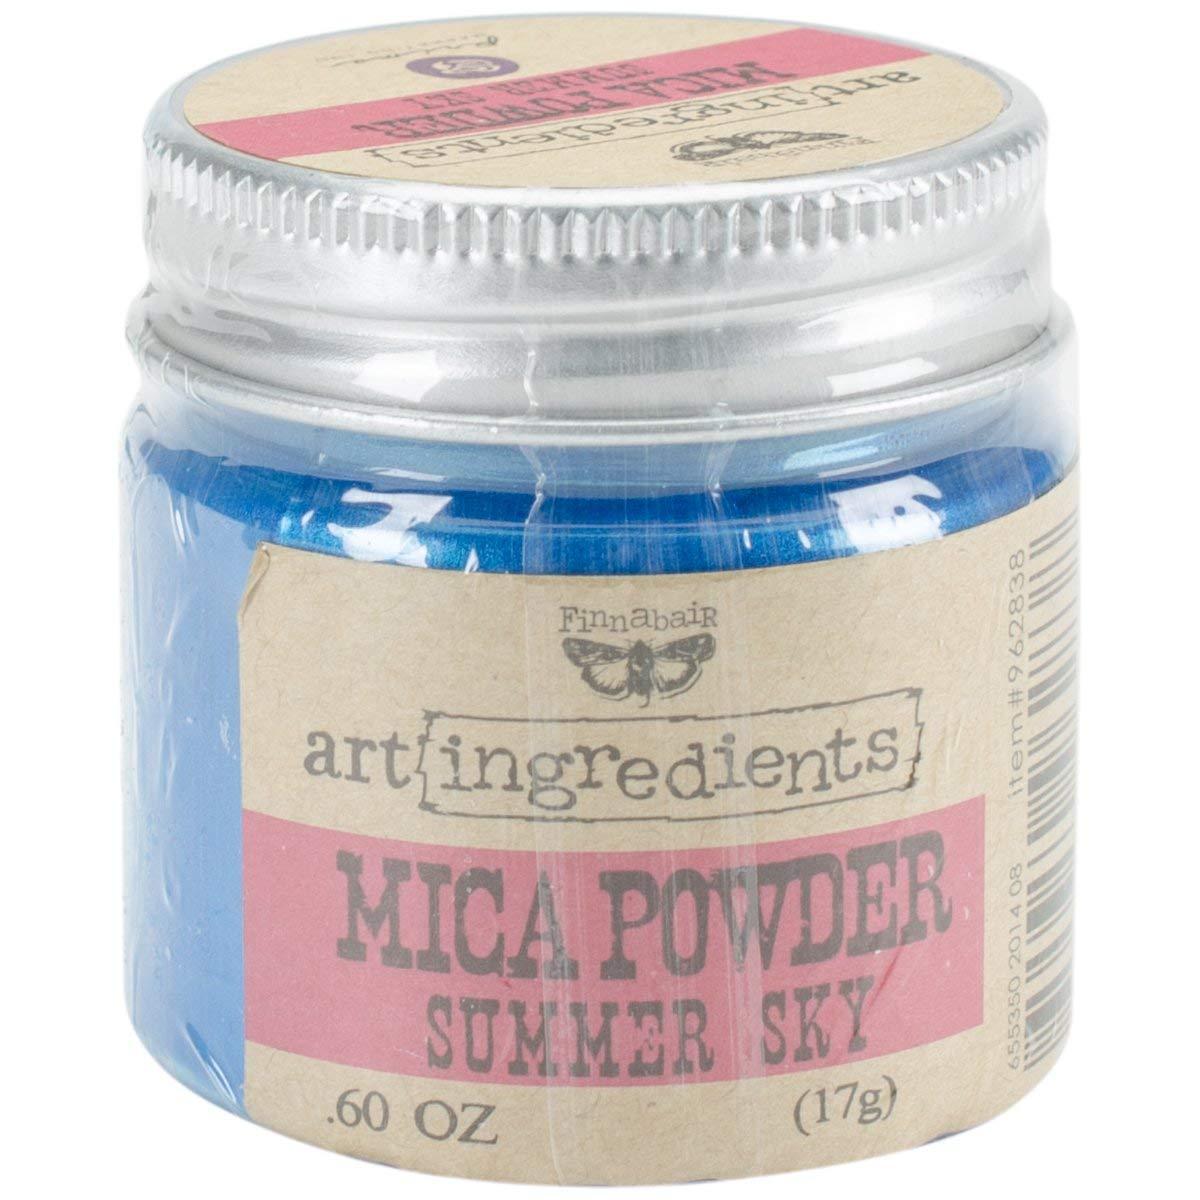 Cheap Shrimp Powder Ingredients, find Shrimp Powder Ingredients